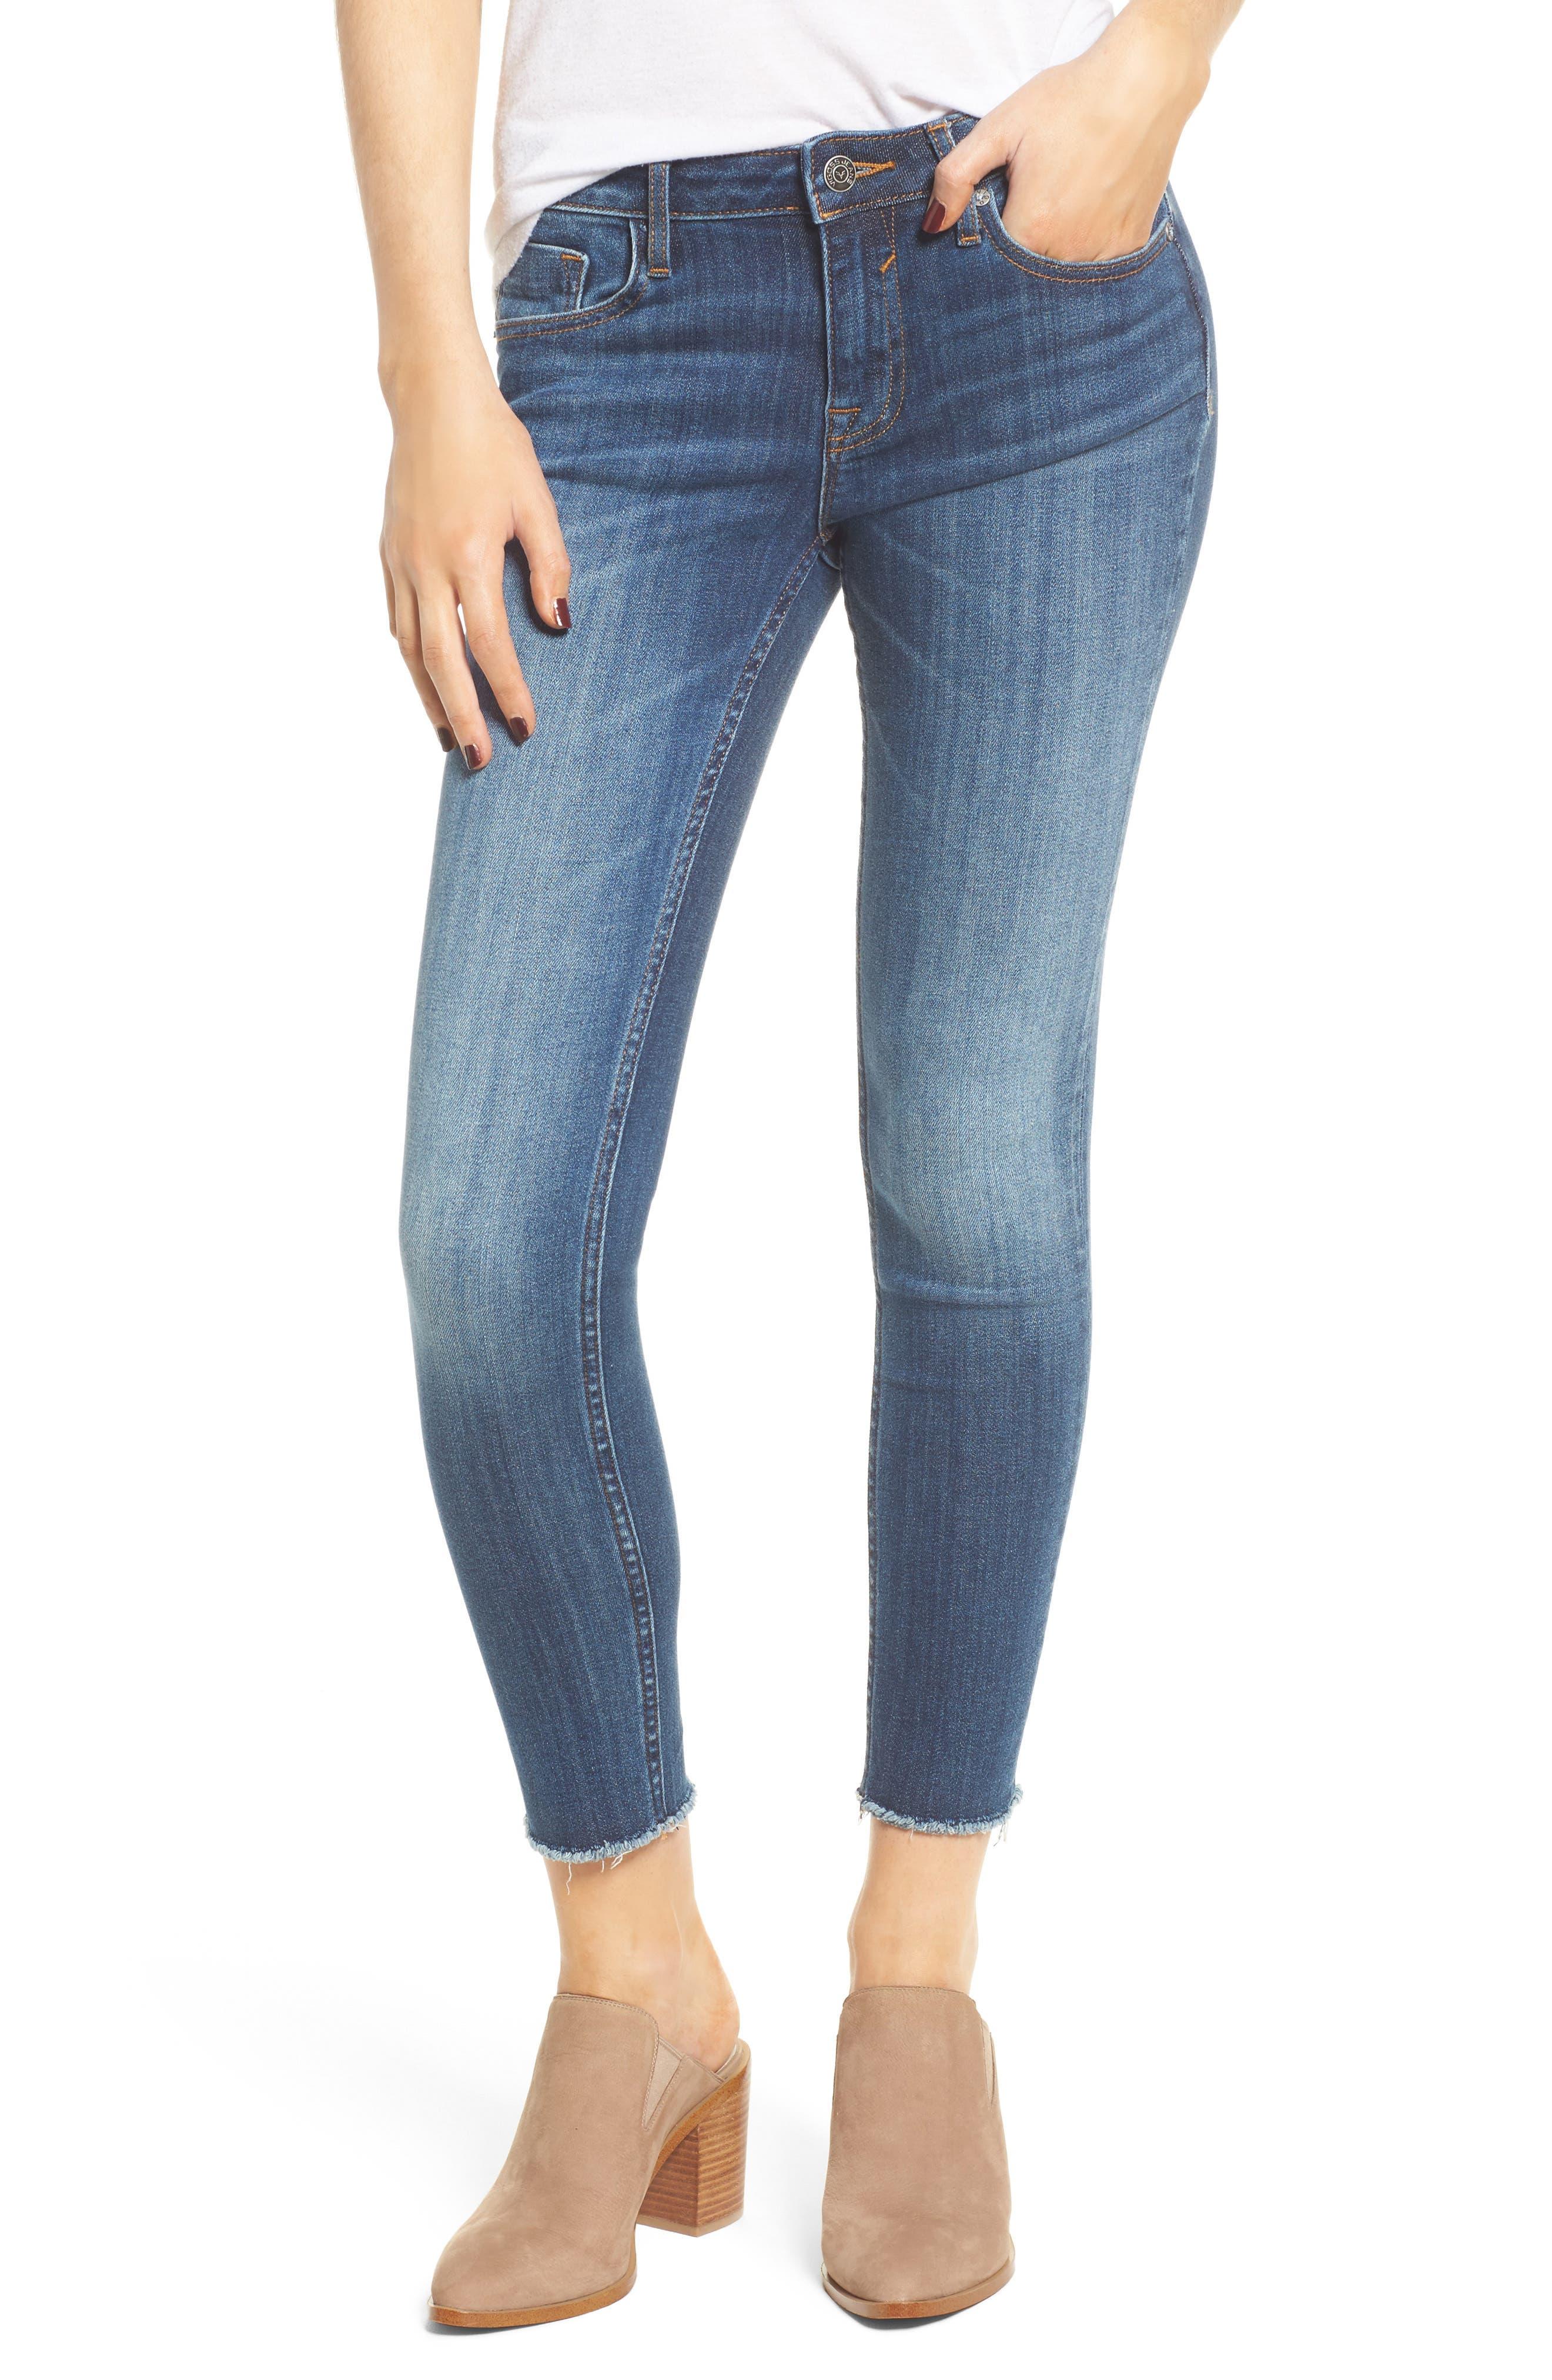 Alternate Image 1 Selected - Vigoss Jagger Mid-Rise Skinny Jeans (Medium Wash)